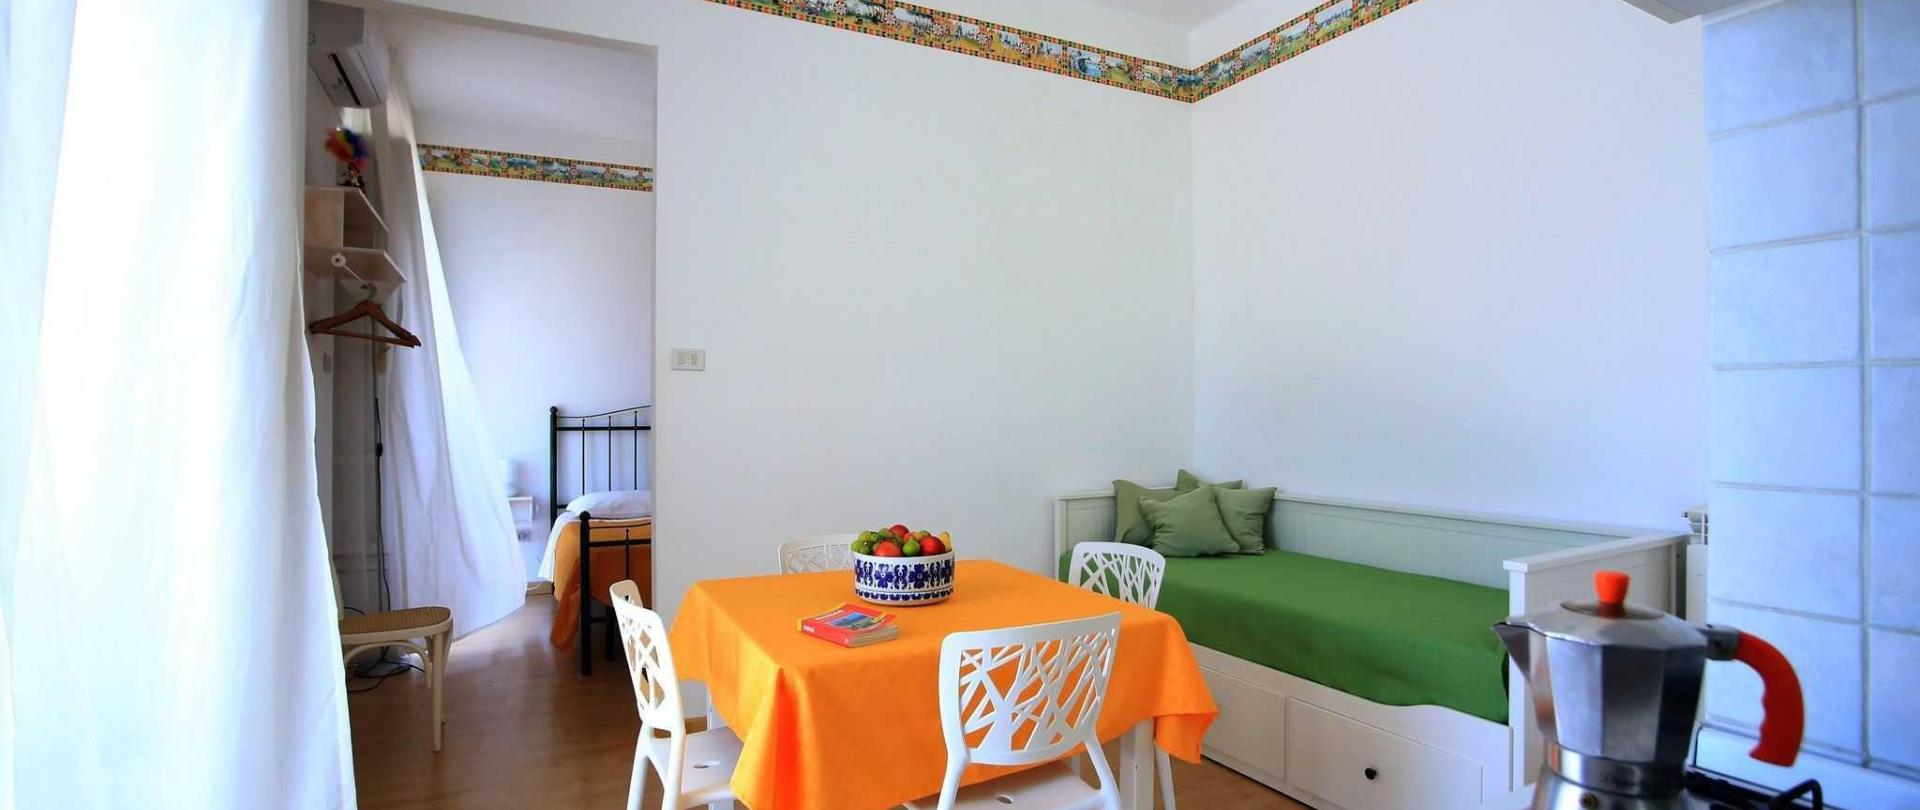 family-interno-cucina-letto.jpg